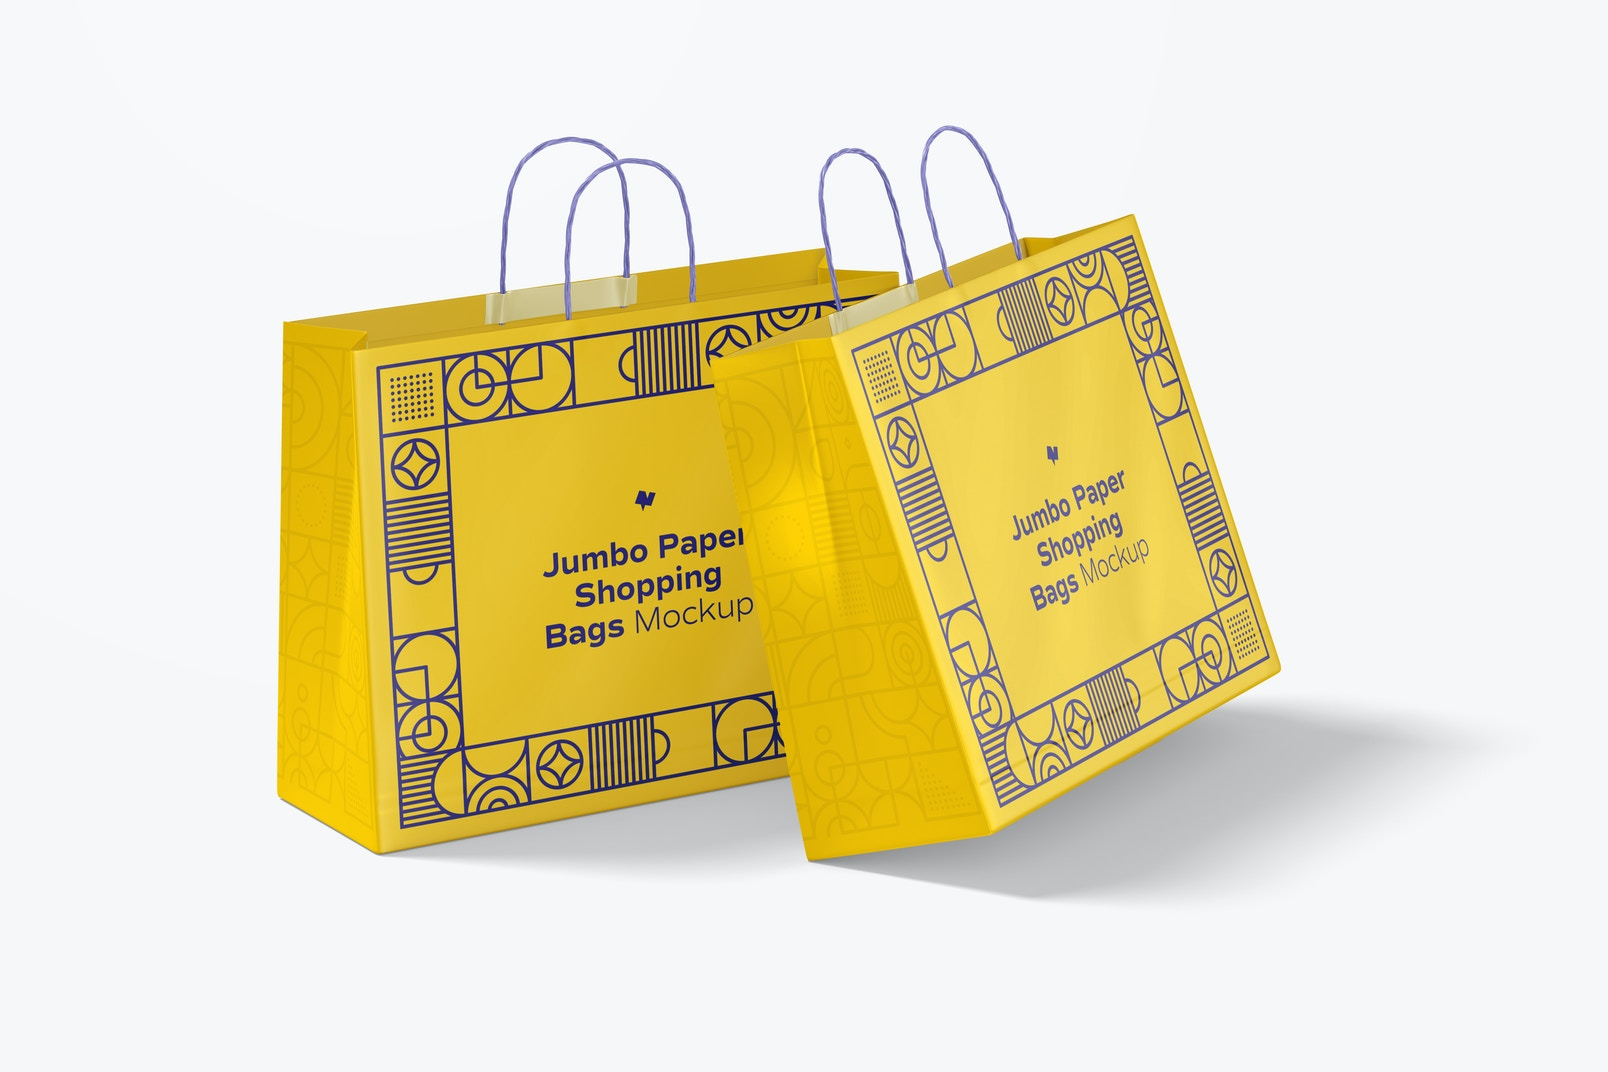 Jumbo Paper Shopping Bags Mockup, Perspective